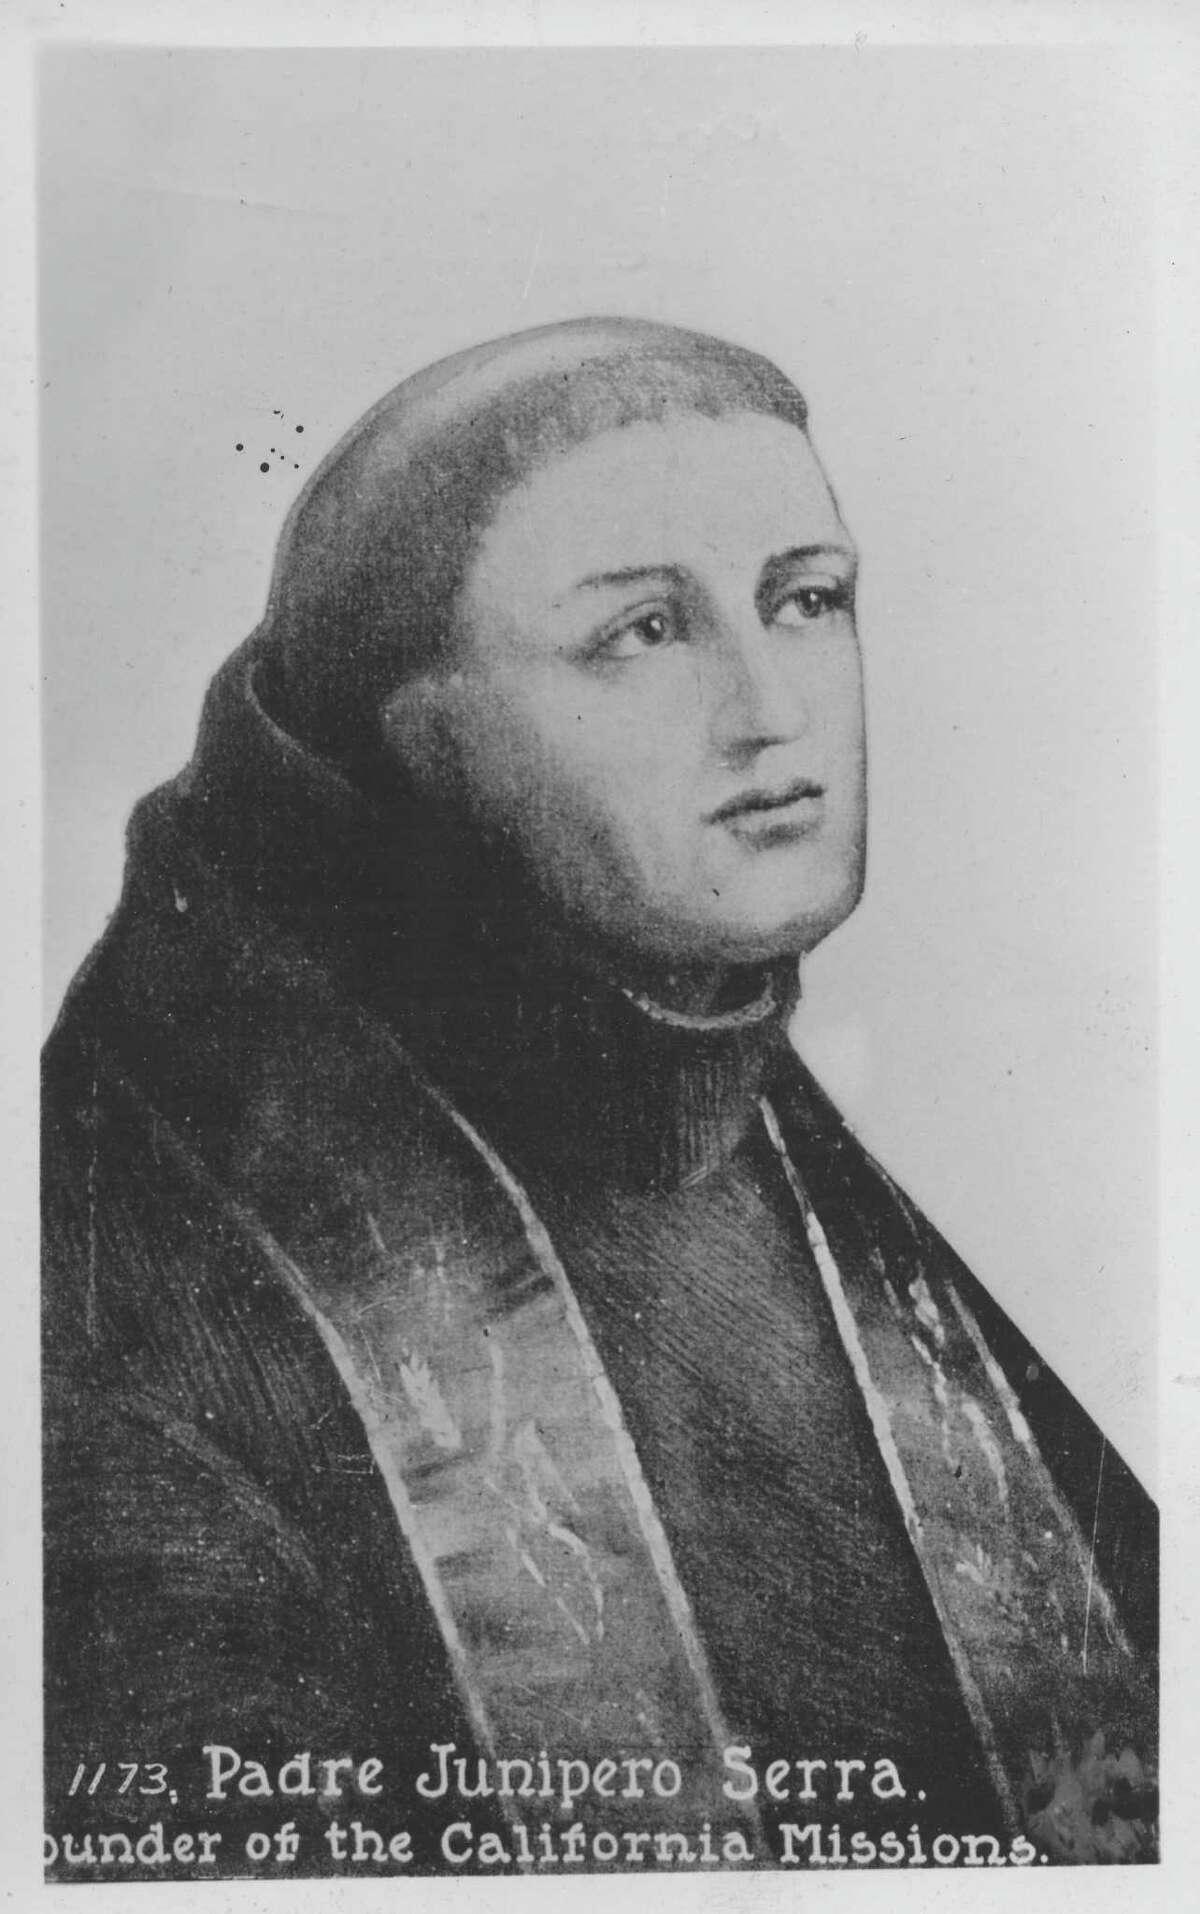 An image of Father Junipero Serra, taken from a postcard.